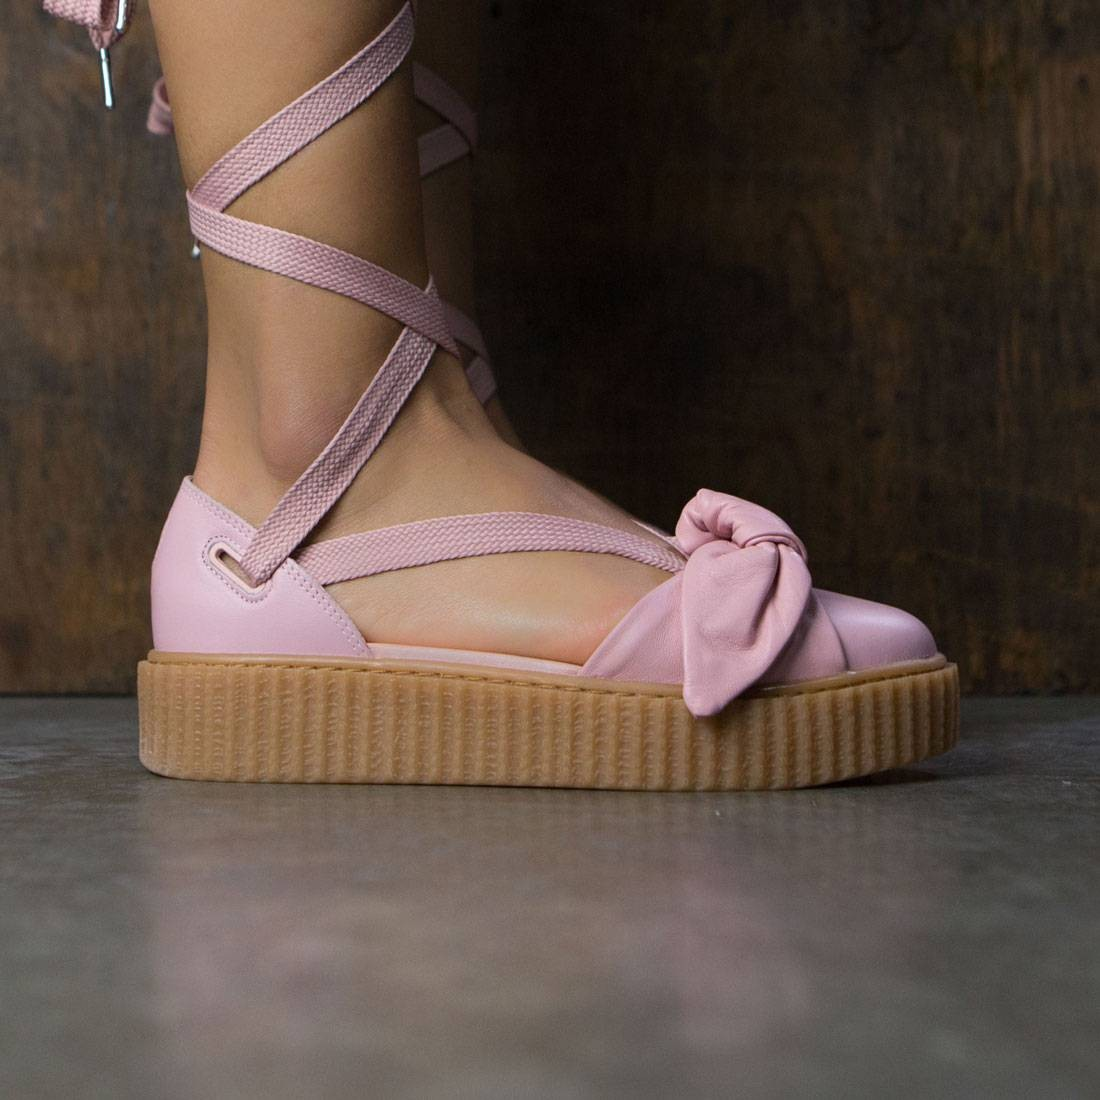 buy online f8d80 535a5 Puma x Fenty By Rihanna Women Bow Creeper Sandal (silver / pink / oatmeal)